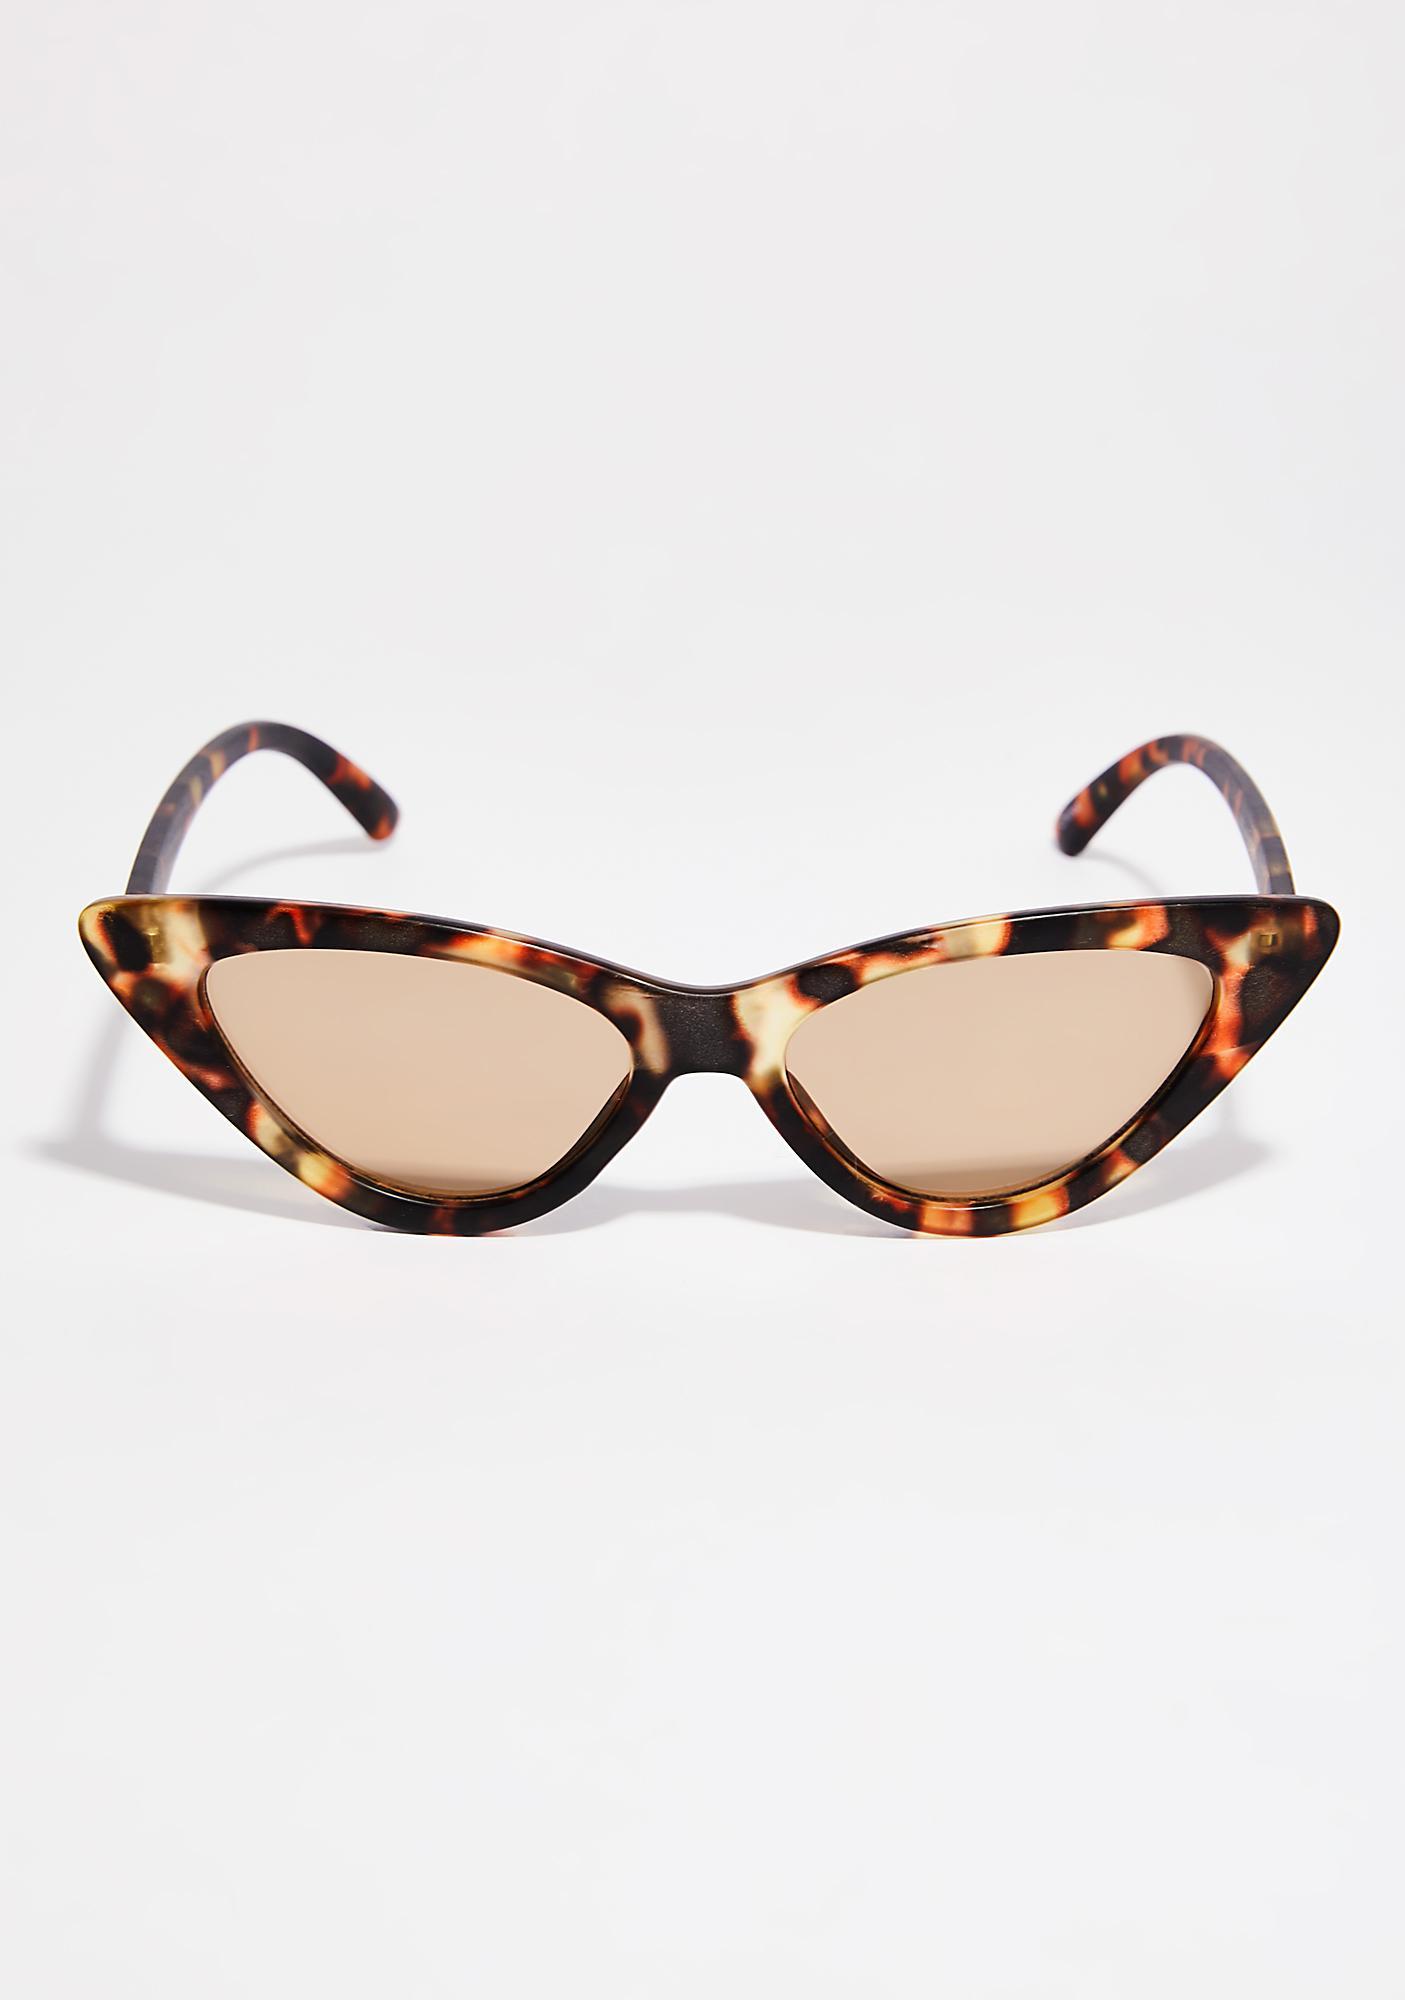 Matte Vibin' On Ya Sunglasses